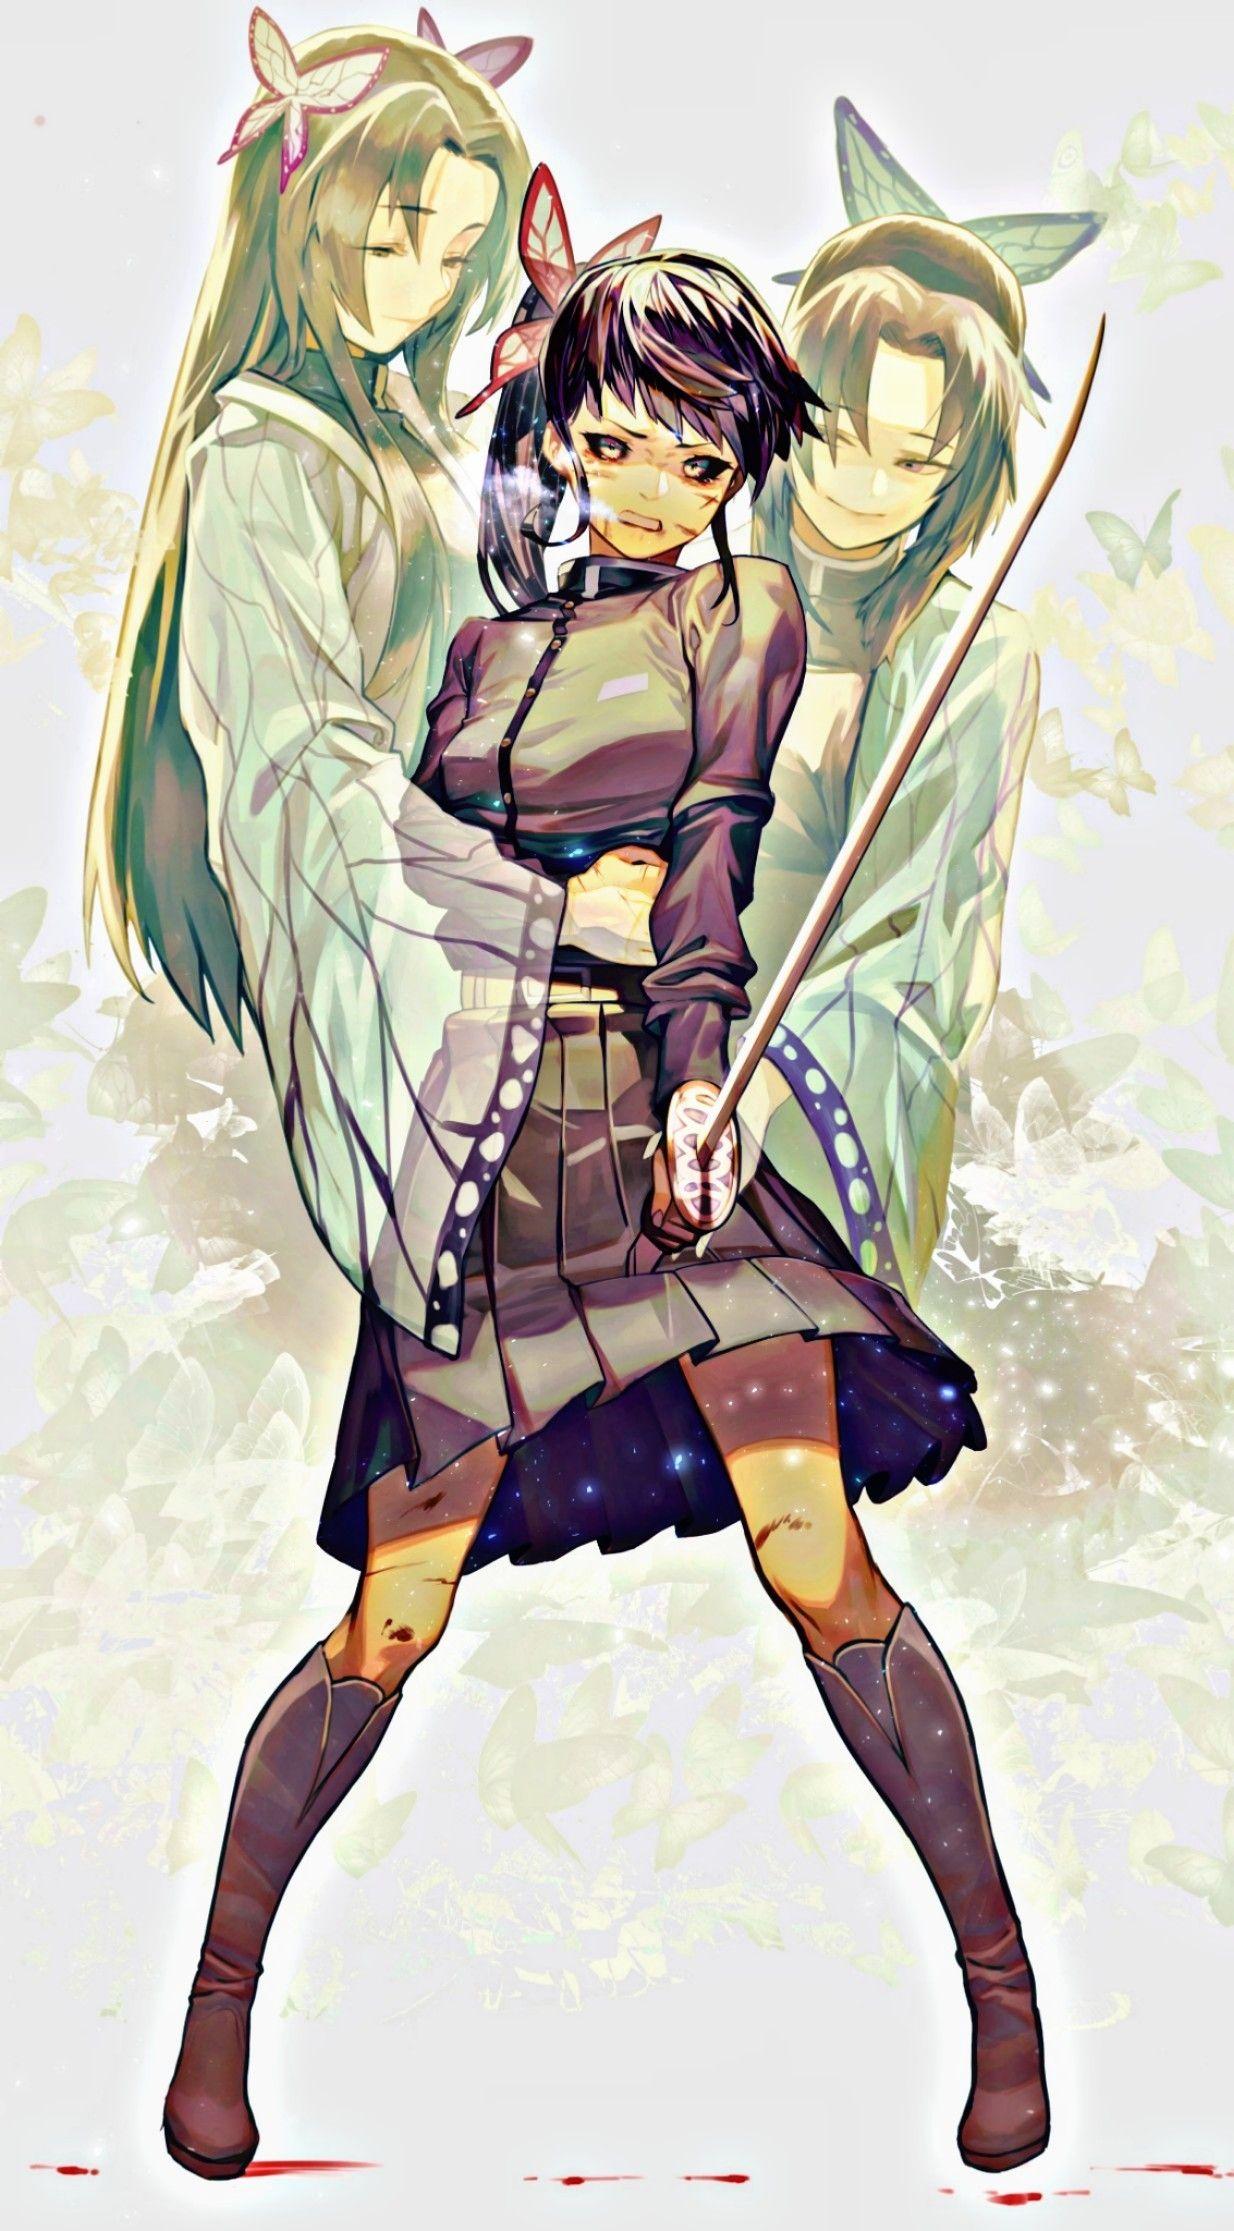 Pin by Kullanit Kachai on Kimetsu no yaiba Slayer anime